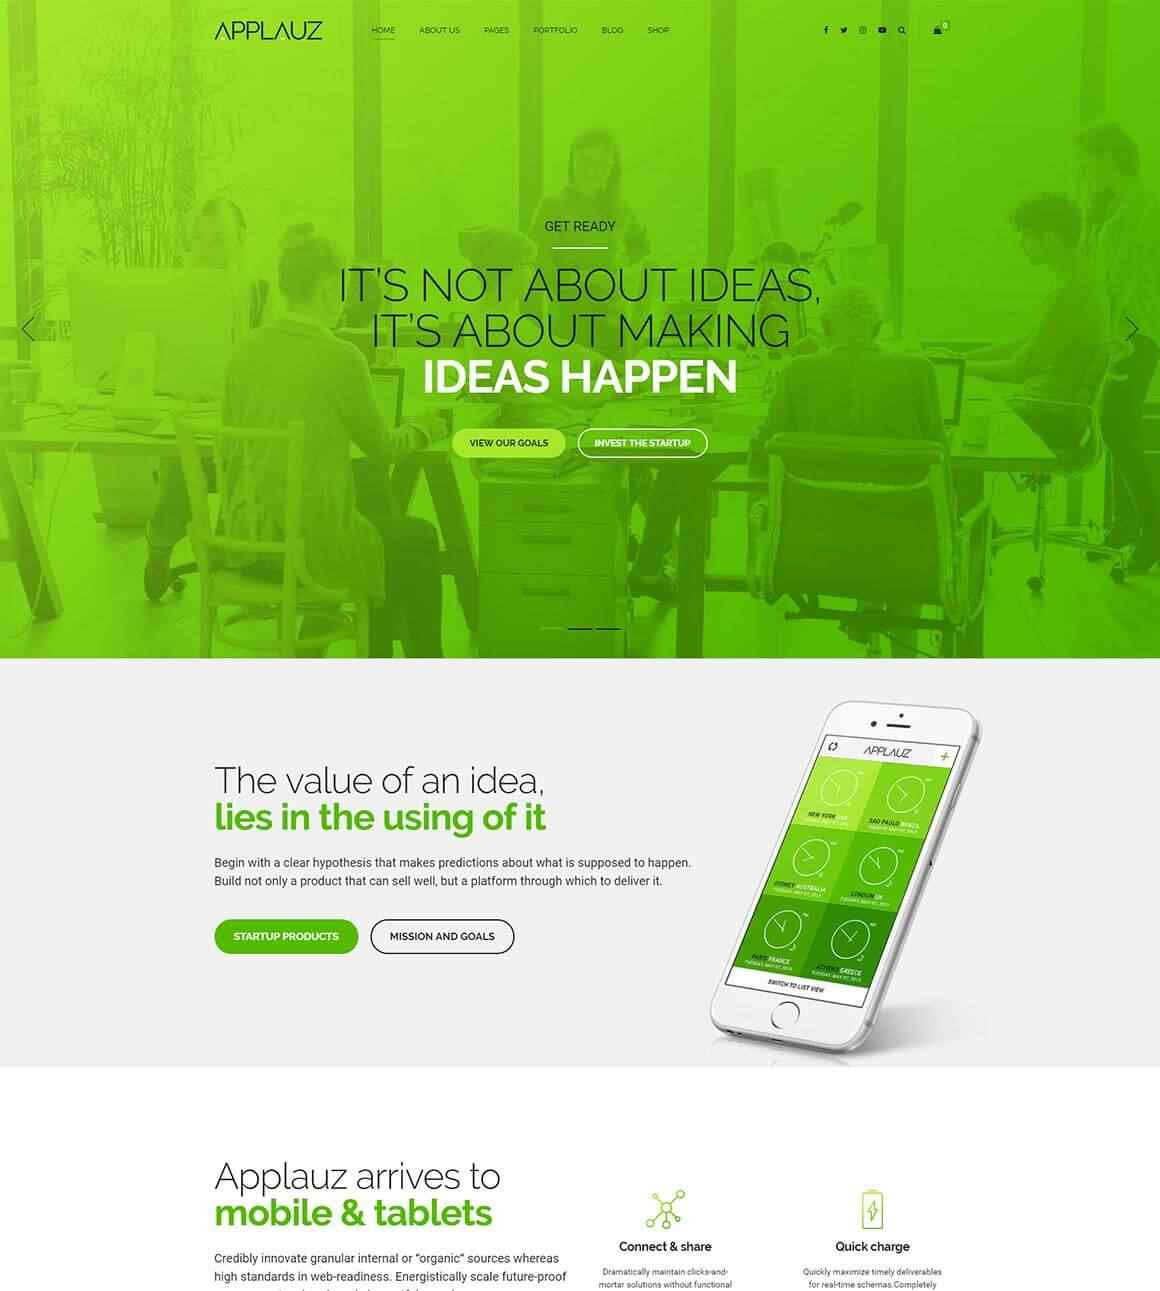 https://coretechies.com/wp-content/uploads/2017/11/Screenshot-Startup.jpg